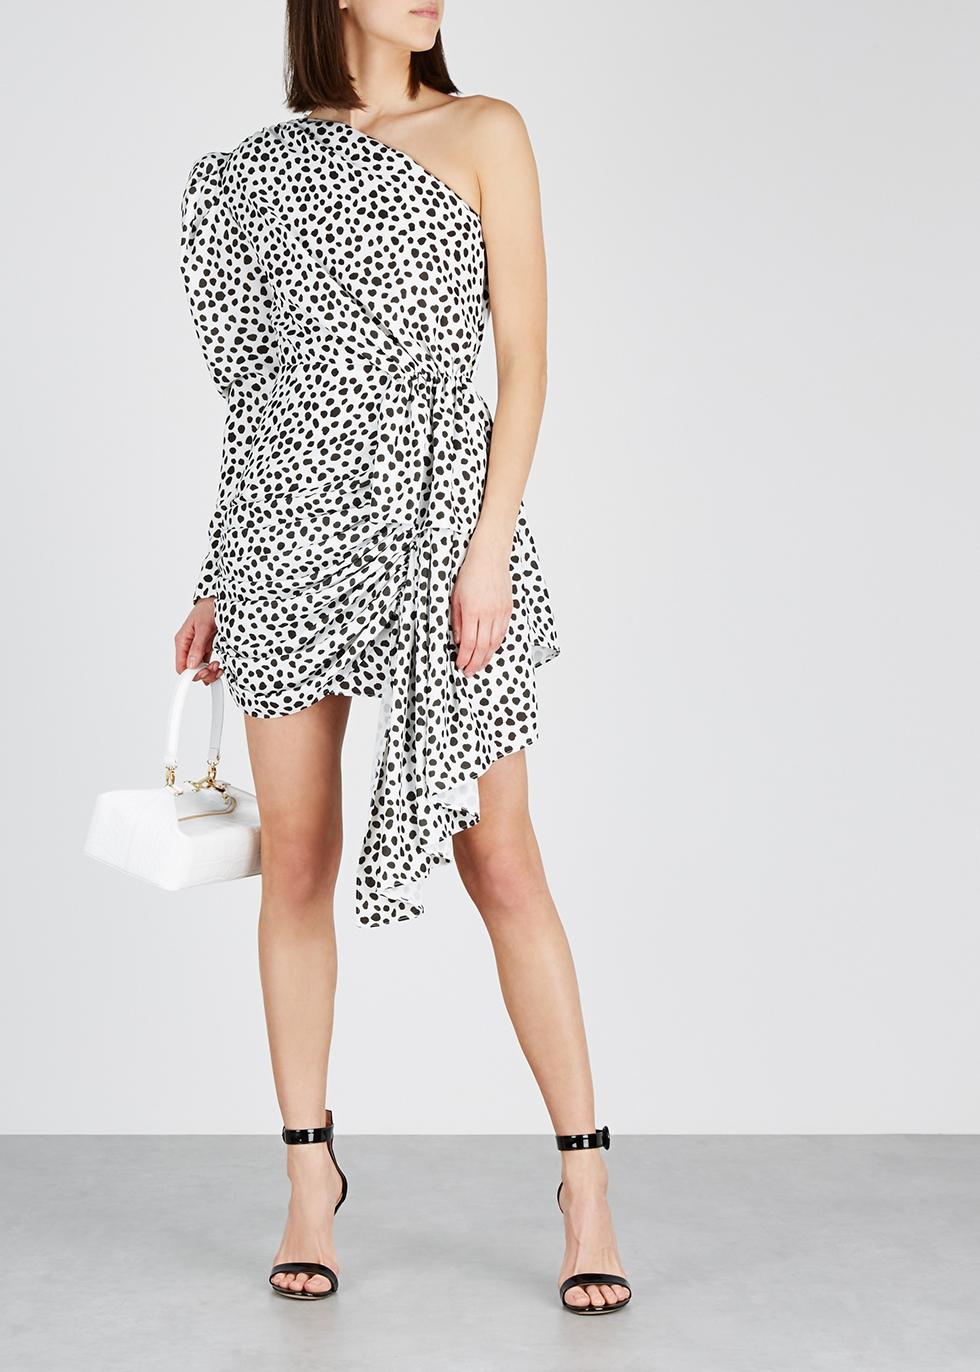 89bd16f5e8 Designer Dresses   Designer Gowns - Harvey Nichols